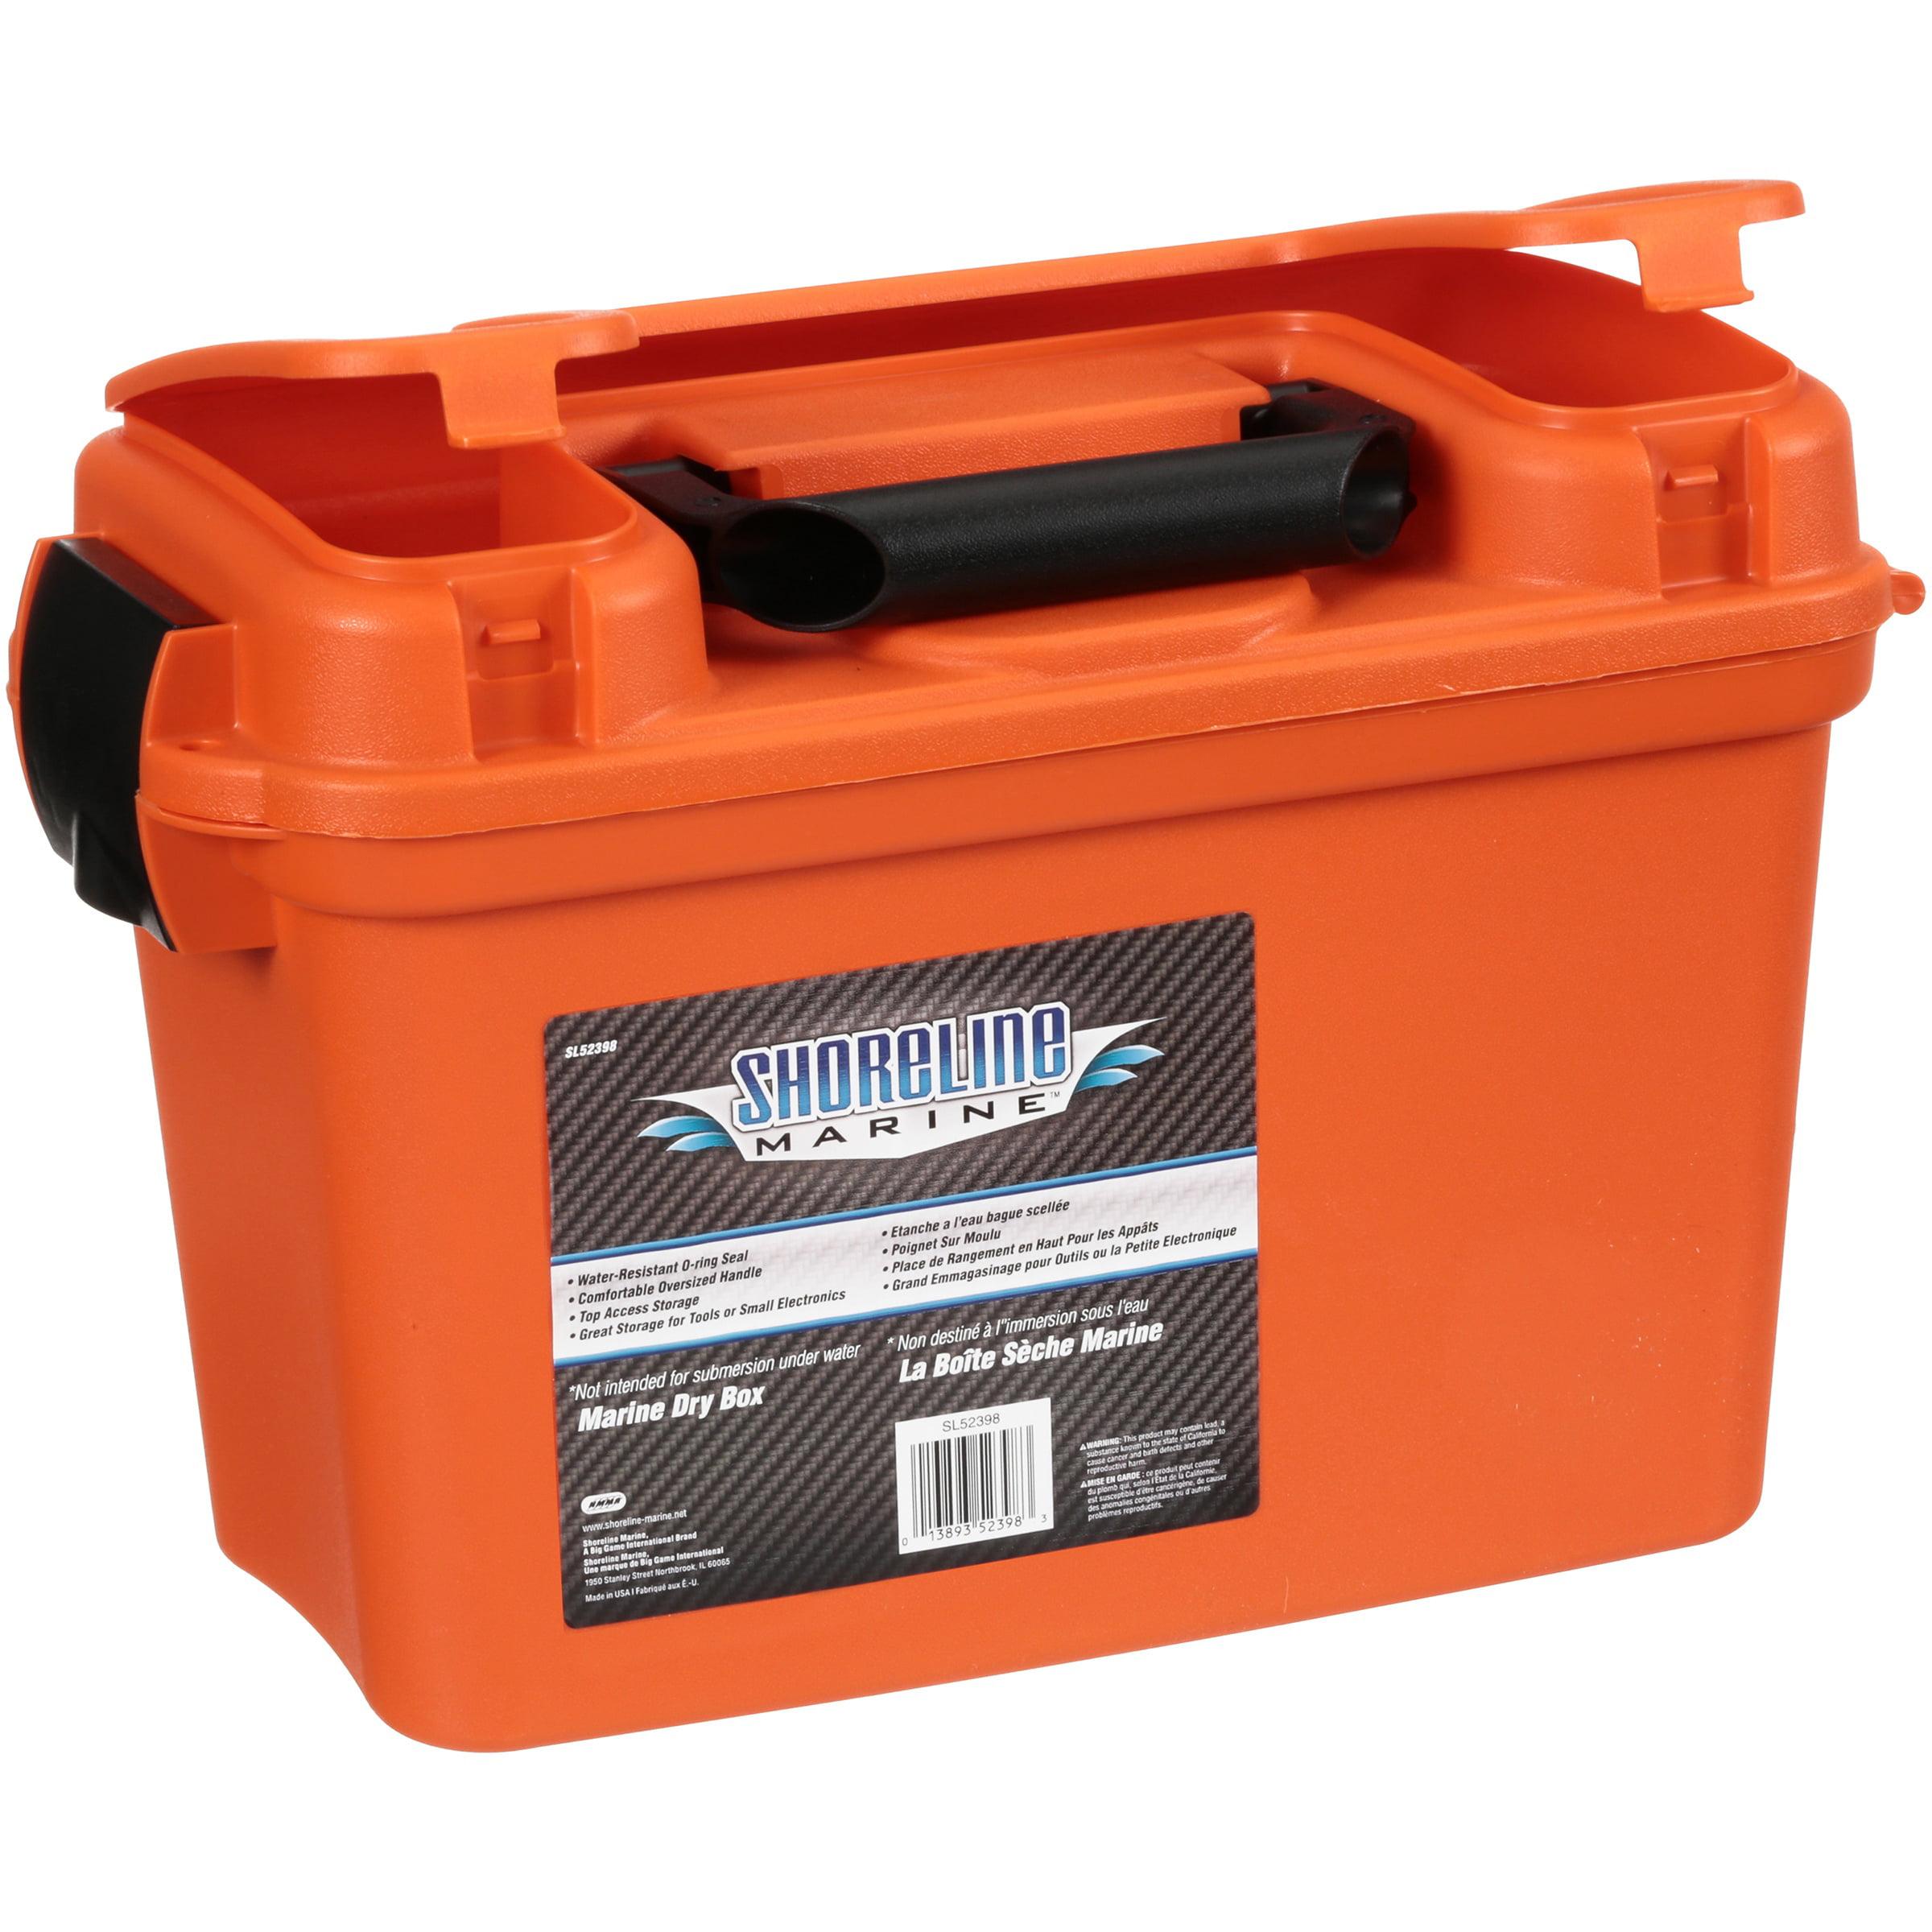 sc 1 st  Walmart & Shoreline Marine™ Marine Dry Box - Walmart.com